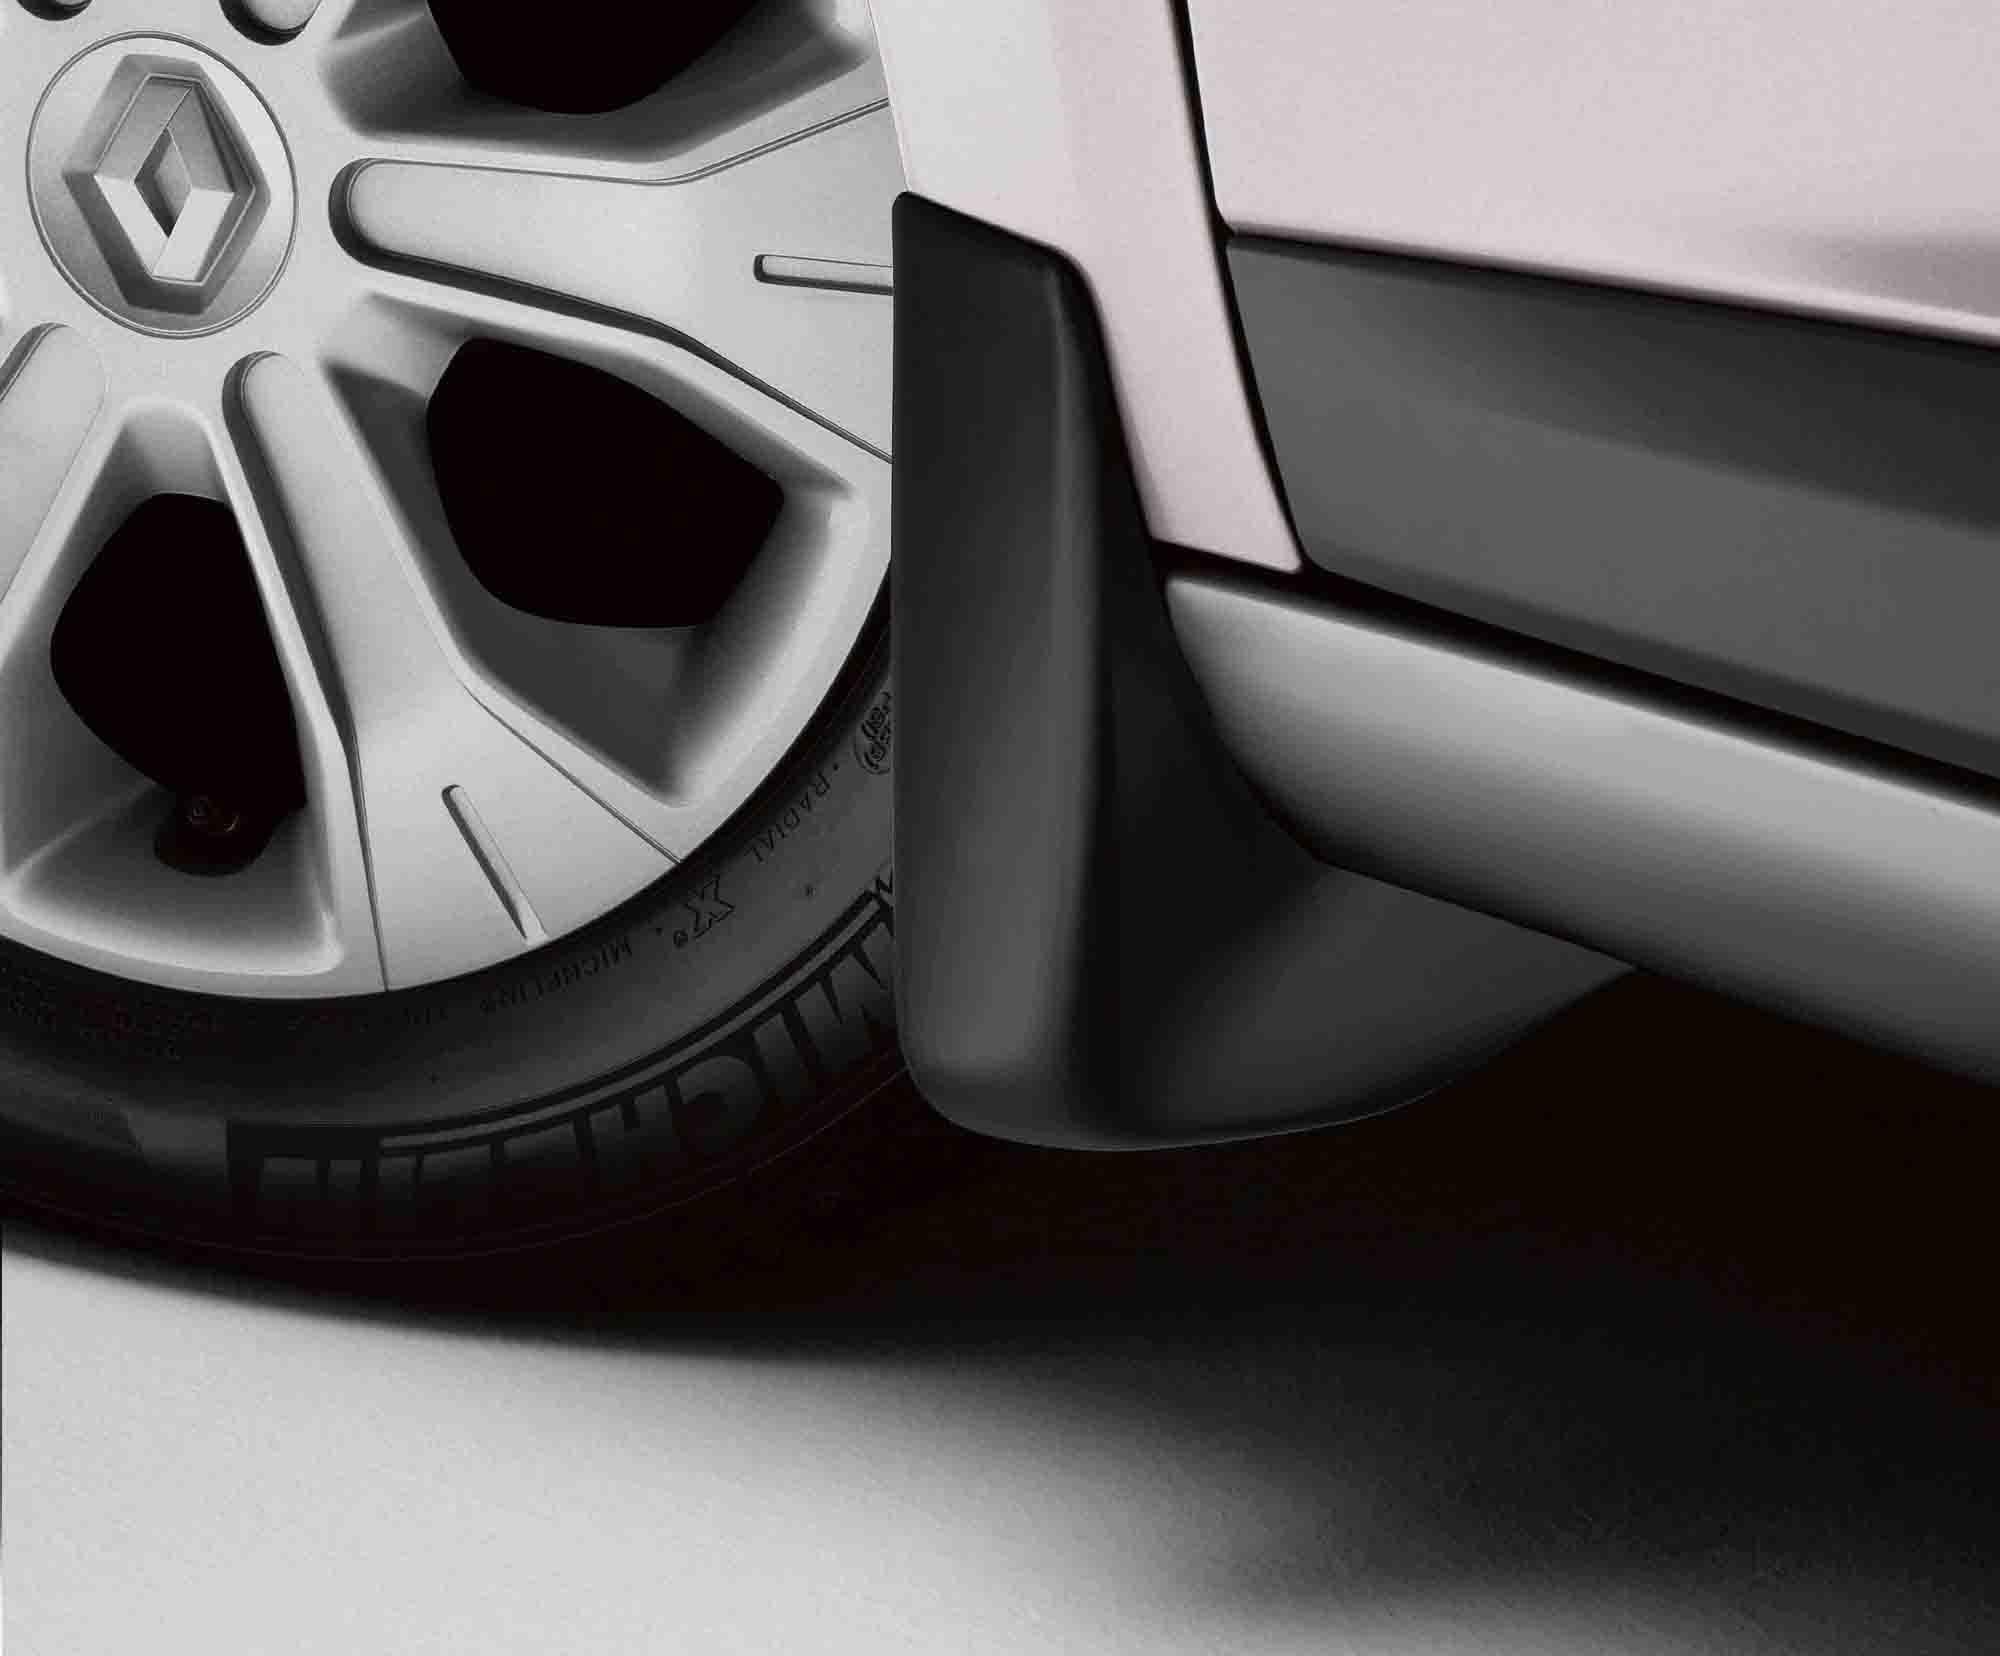 Renault Megane Sport Tourer Fuse Box : Renault genuine megane iii range front mudguards mud flaps